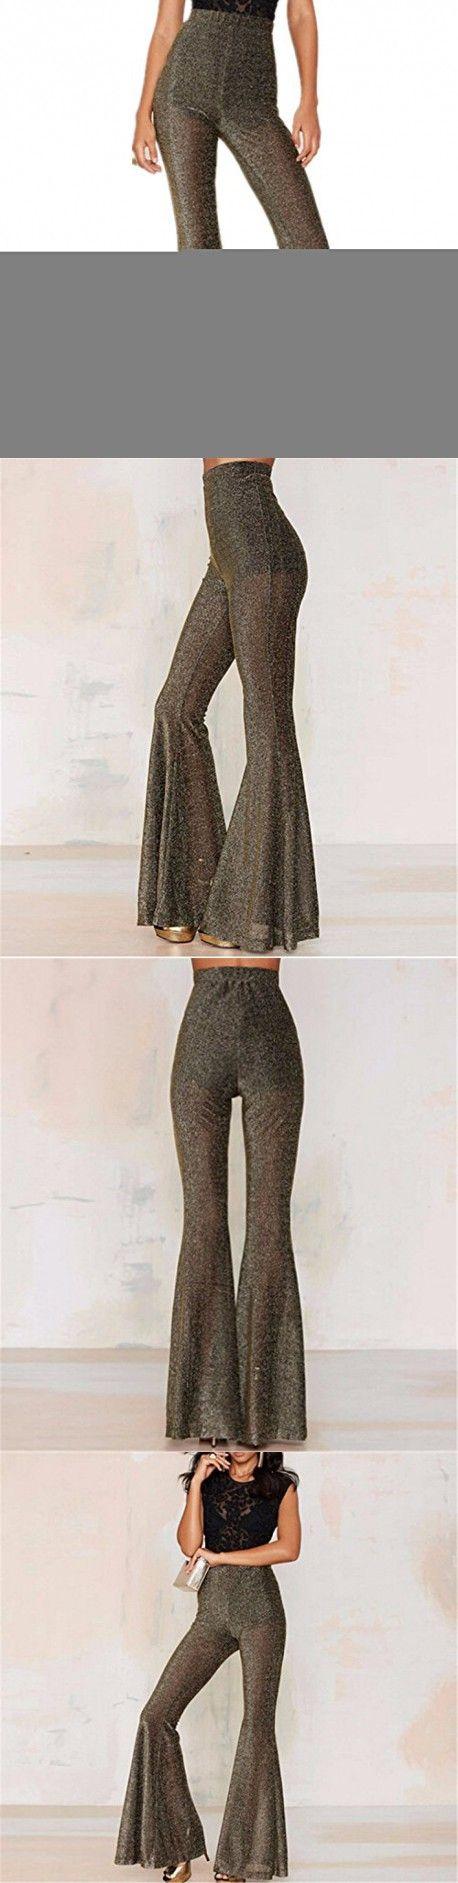 Wiipu Women's Transparent Wide Leg Pants Cut Out Trousers Flare Pants(J887)-Large Goldn